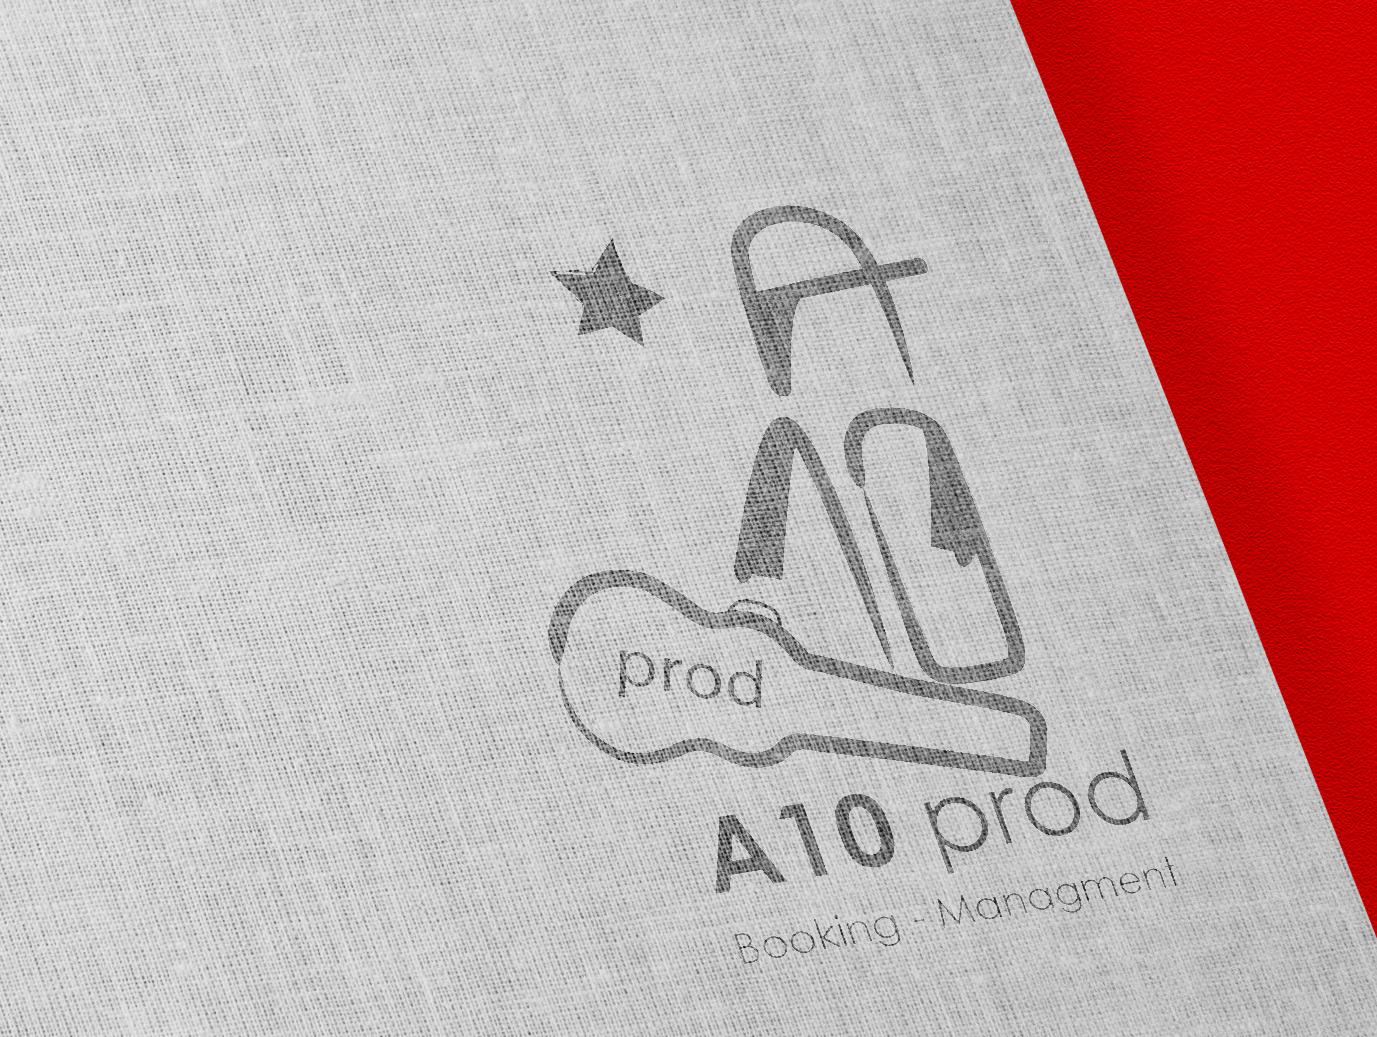 A10 Prod